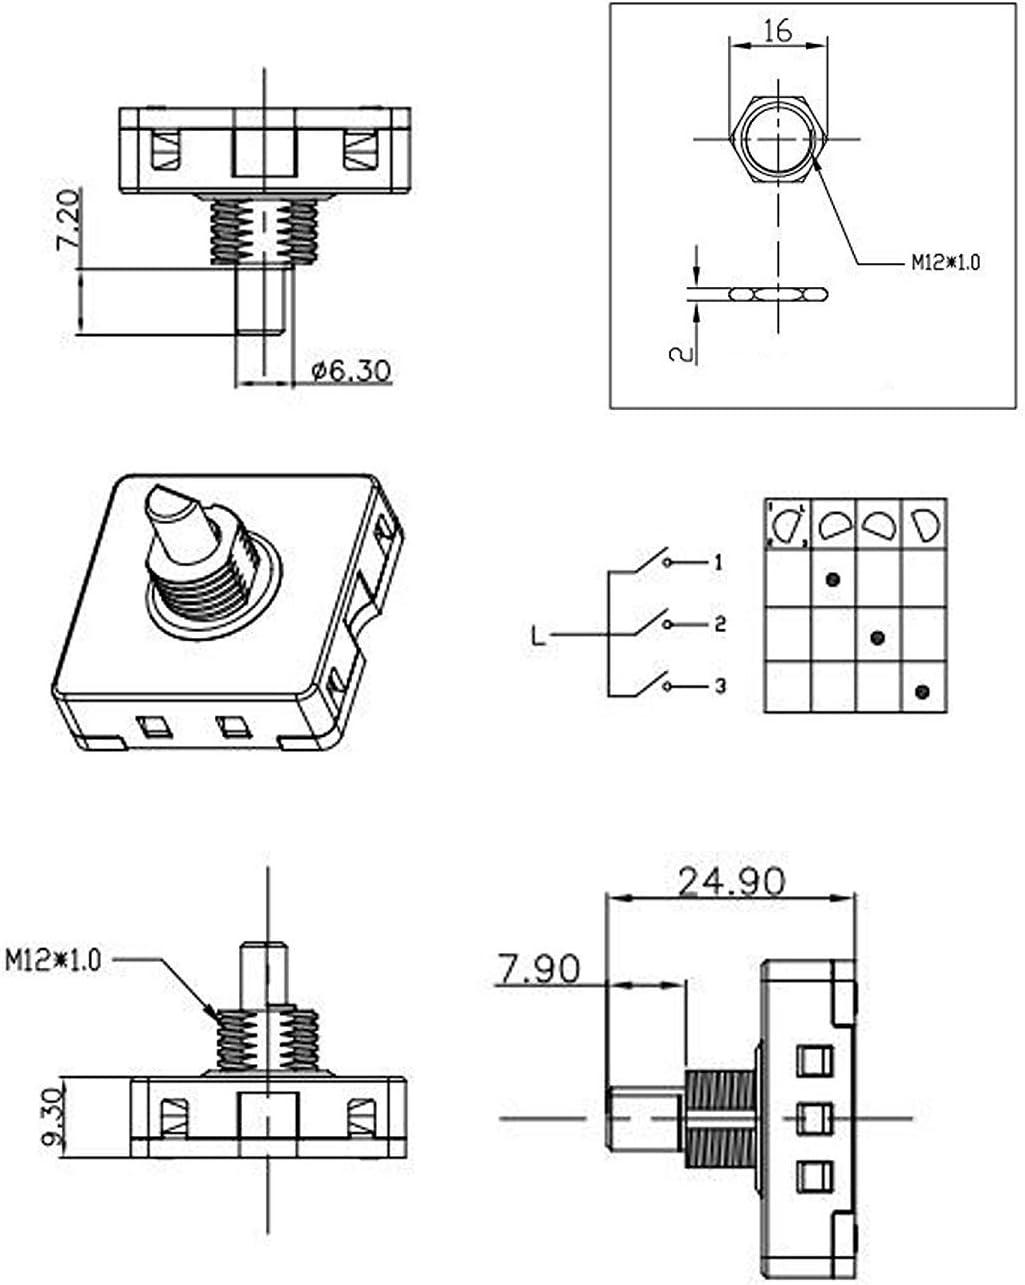 Amazon.com: HQRP 4-Position 3-Speed Fan Selector Rotary Switch Compatible  with Patton U2-1487 U2-1887 Fan Coaster: Home ImprovementAmazon.com